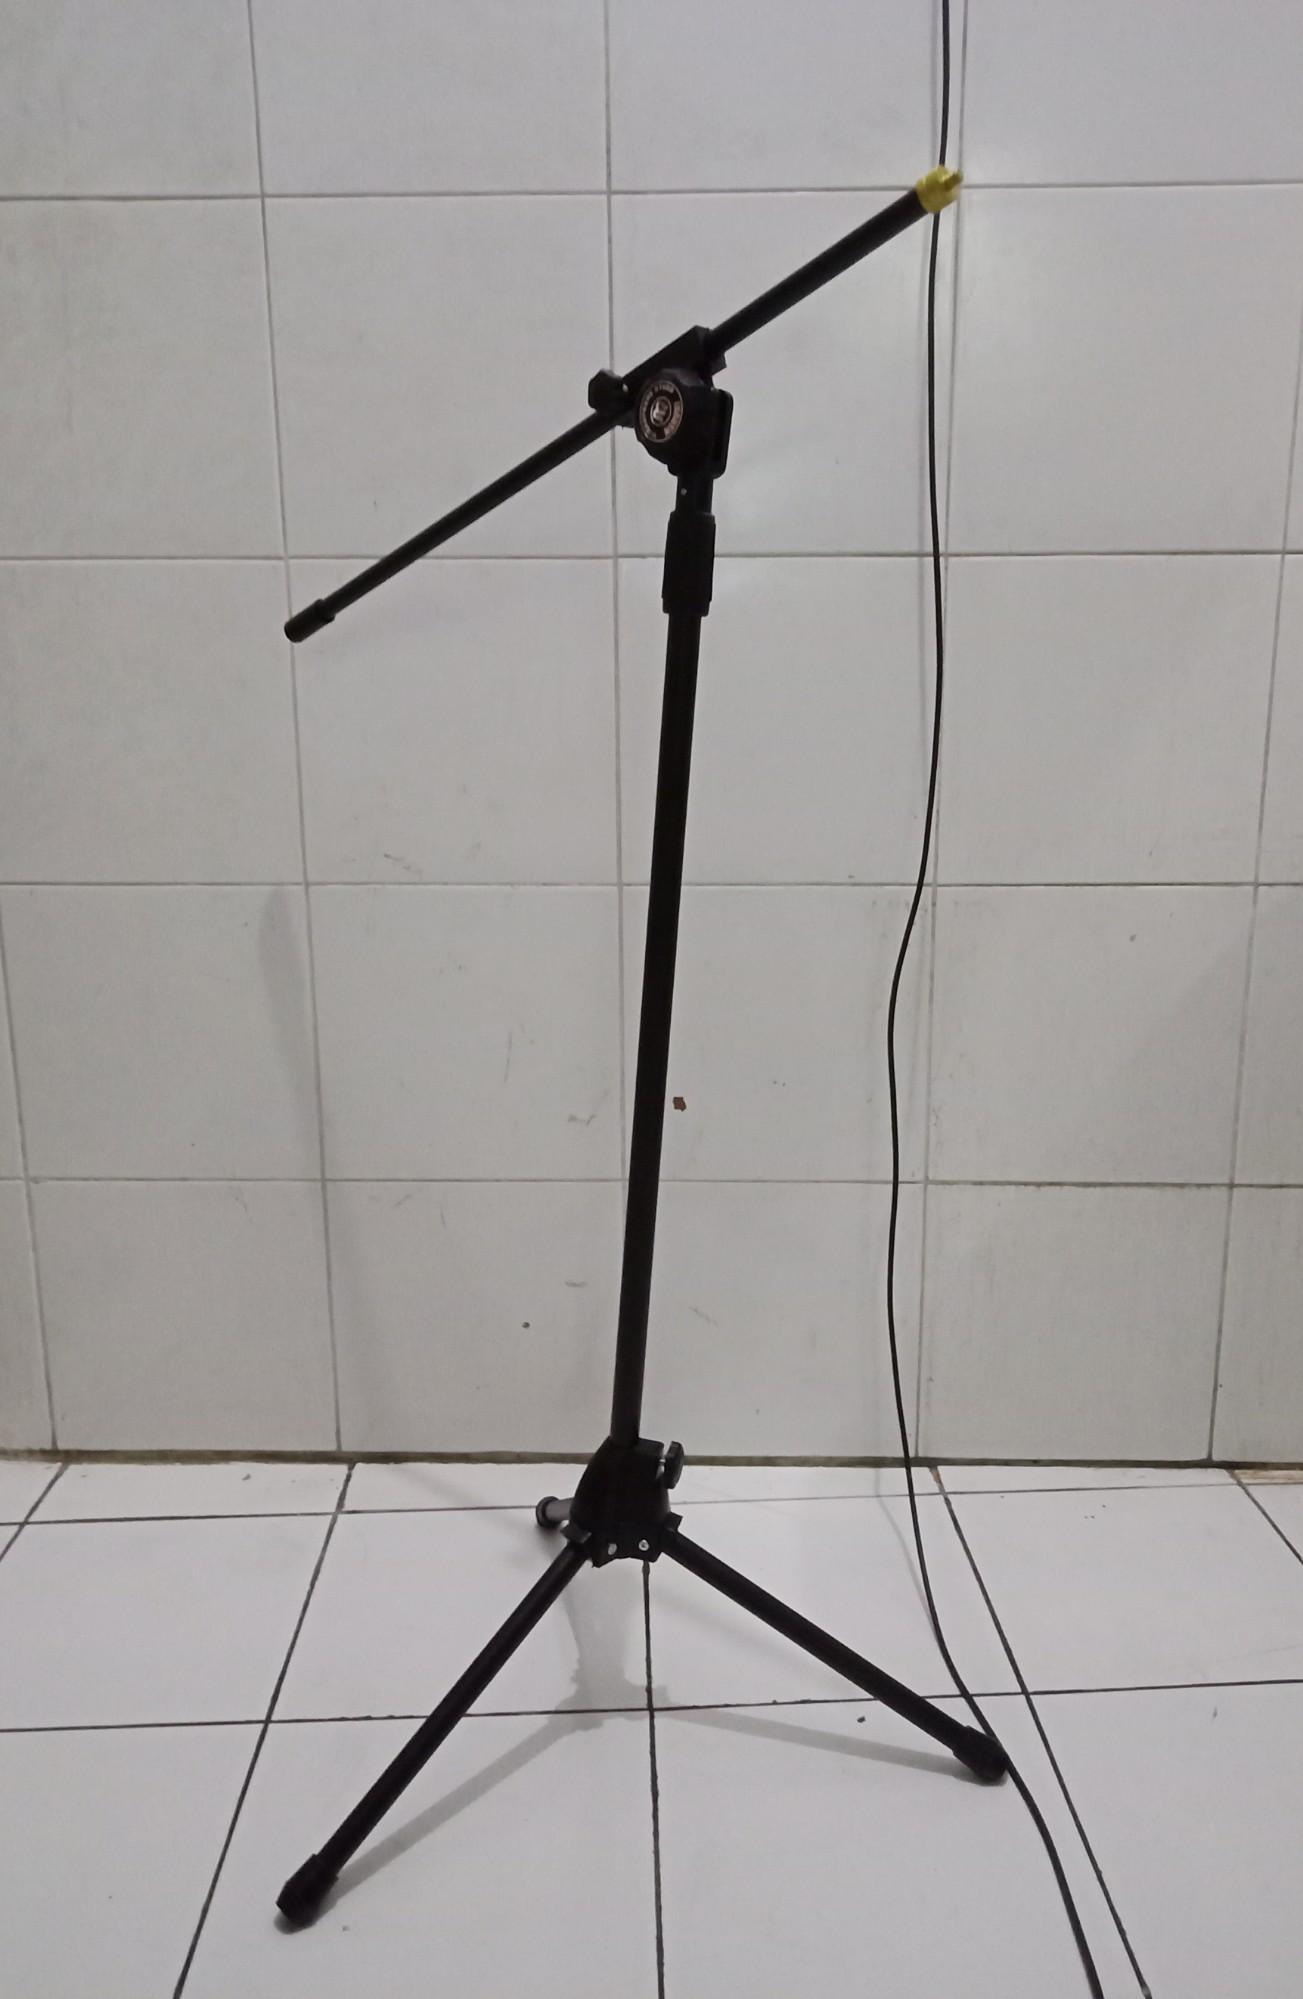 Stand mic Tripod maruni panjang